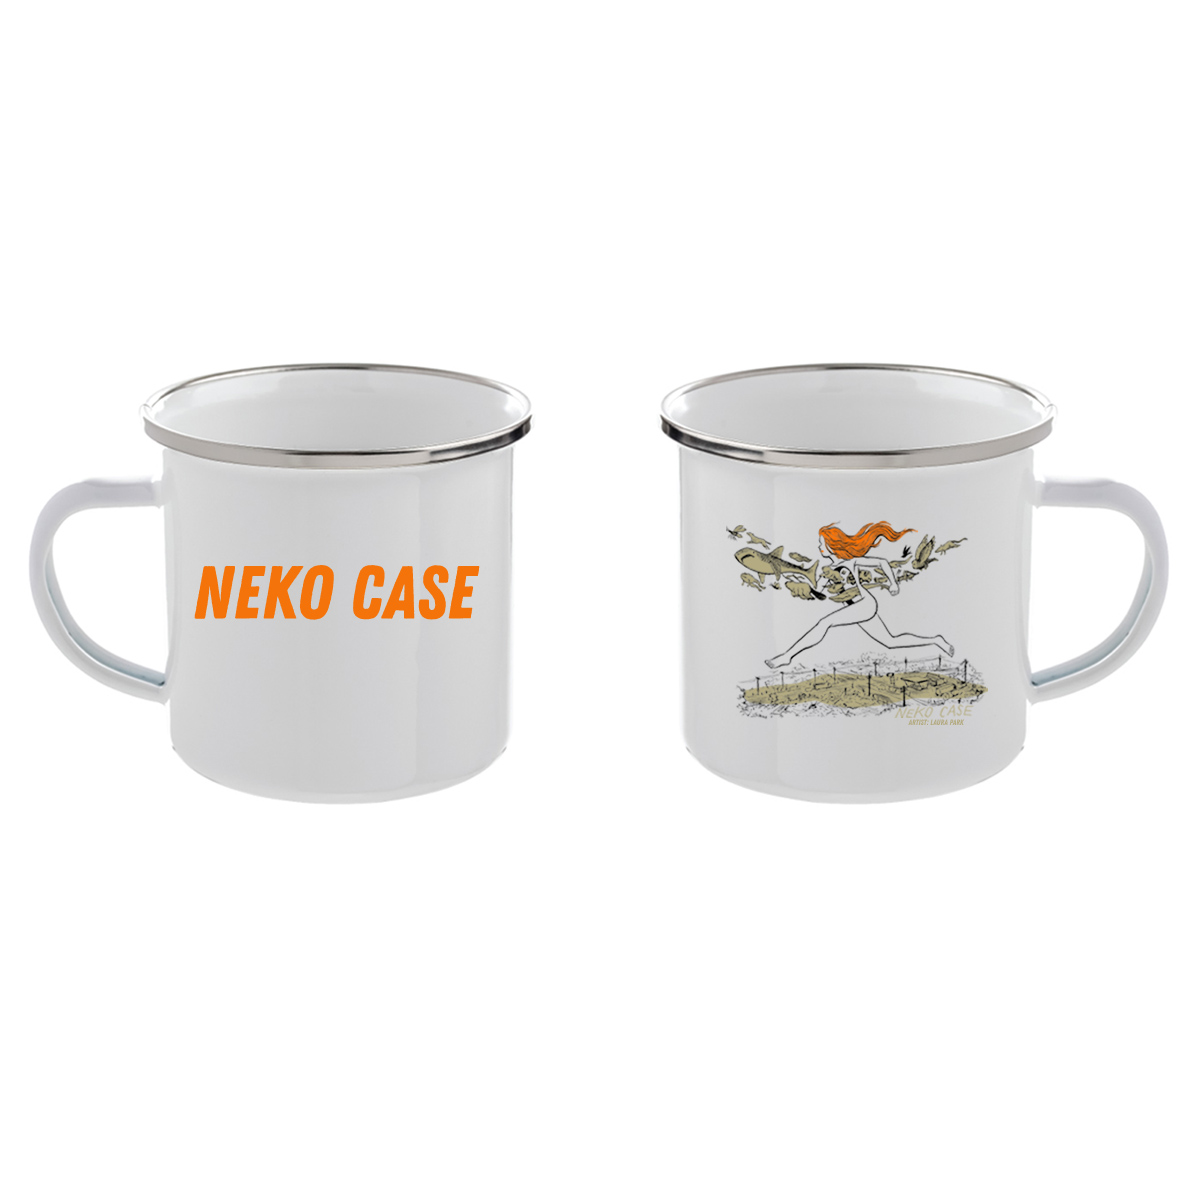 Neko On The Run 12 oz. Enamel Mug